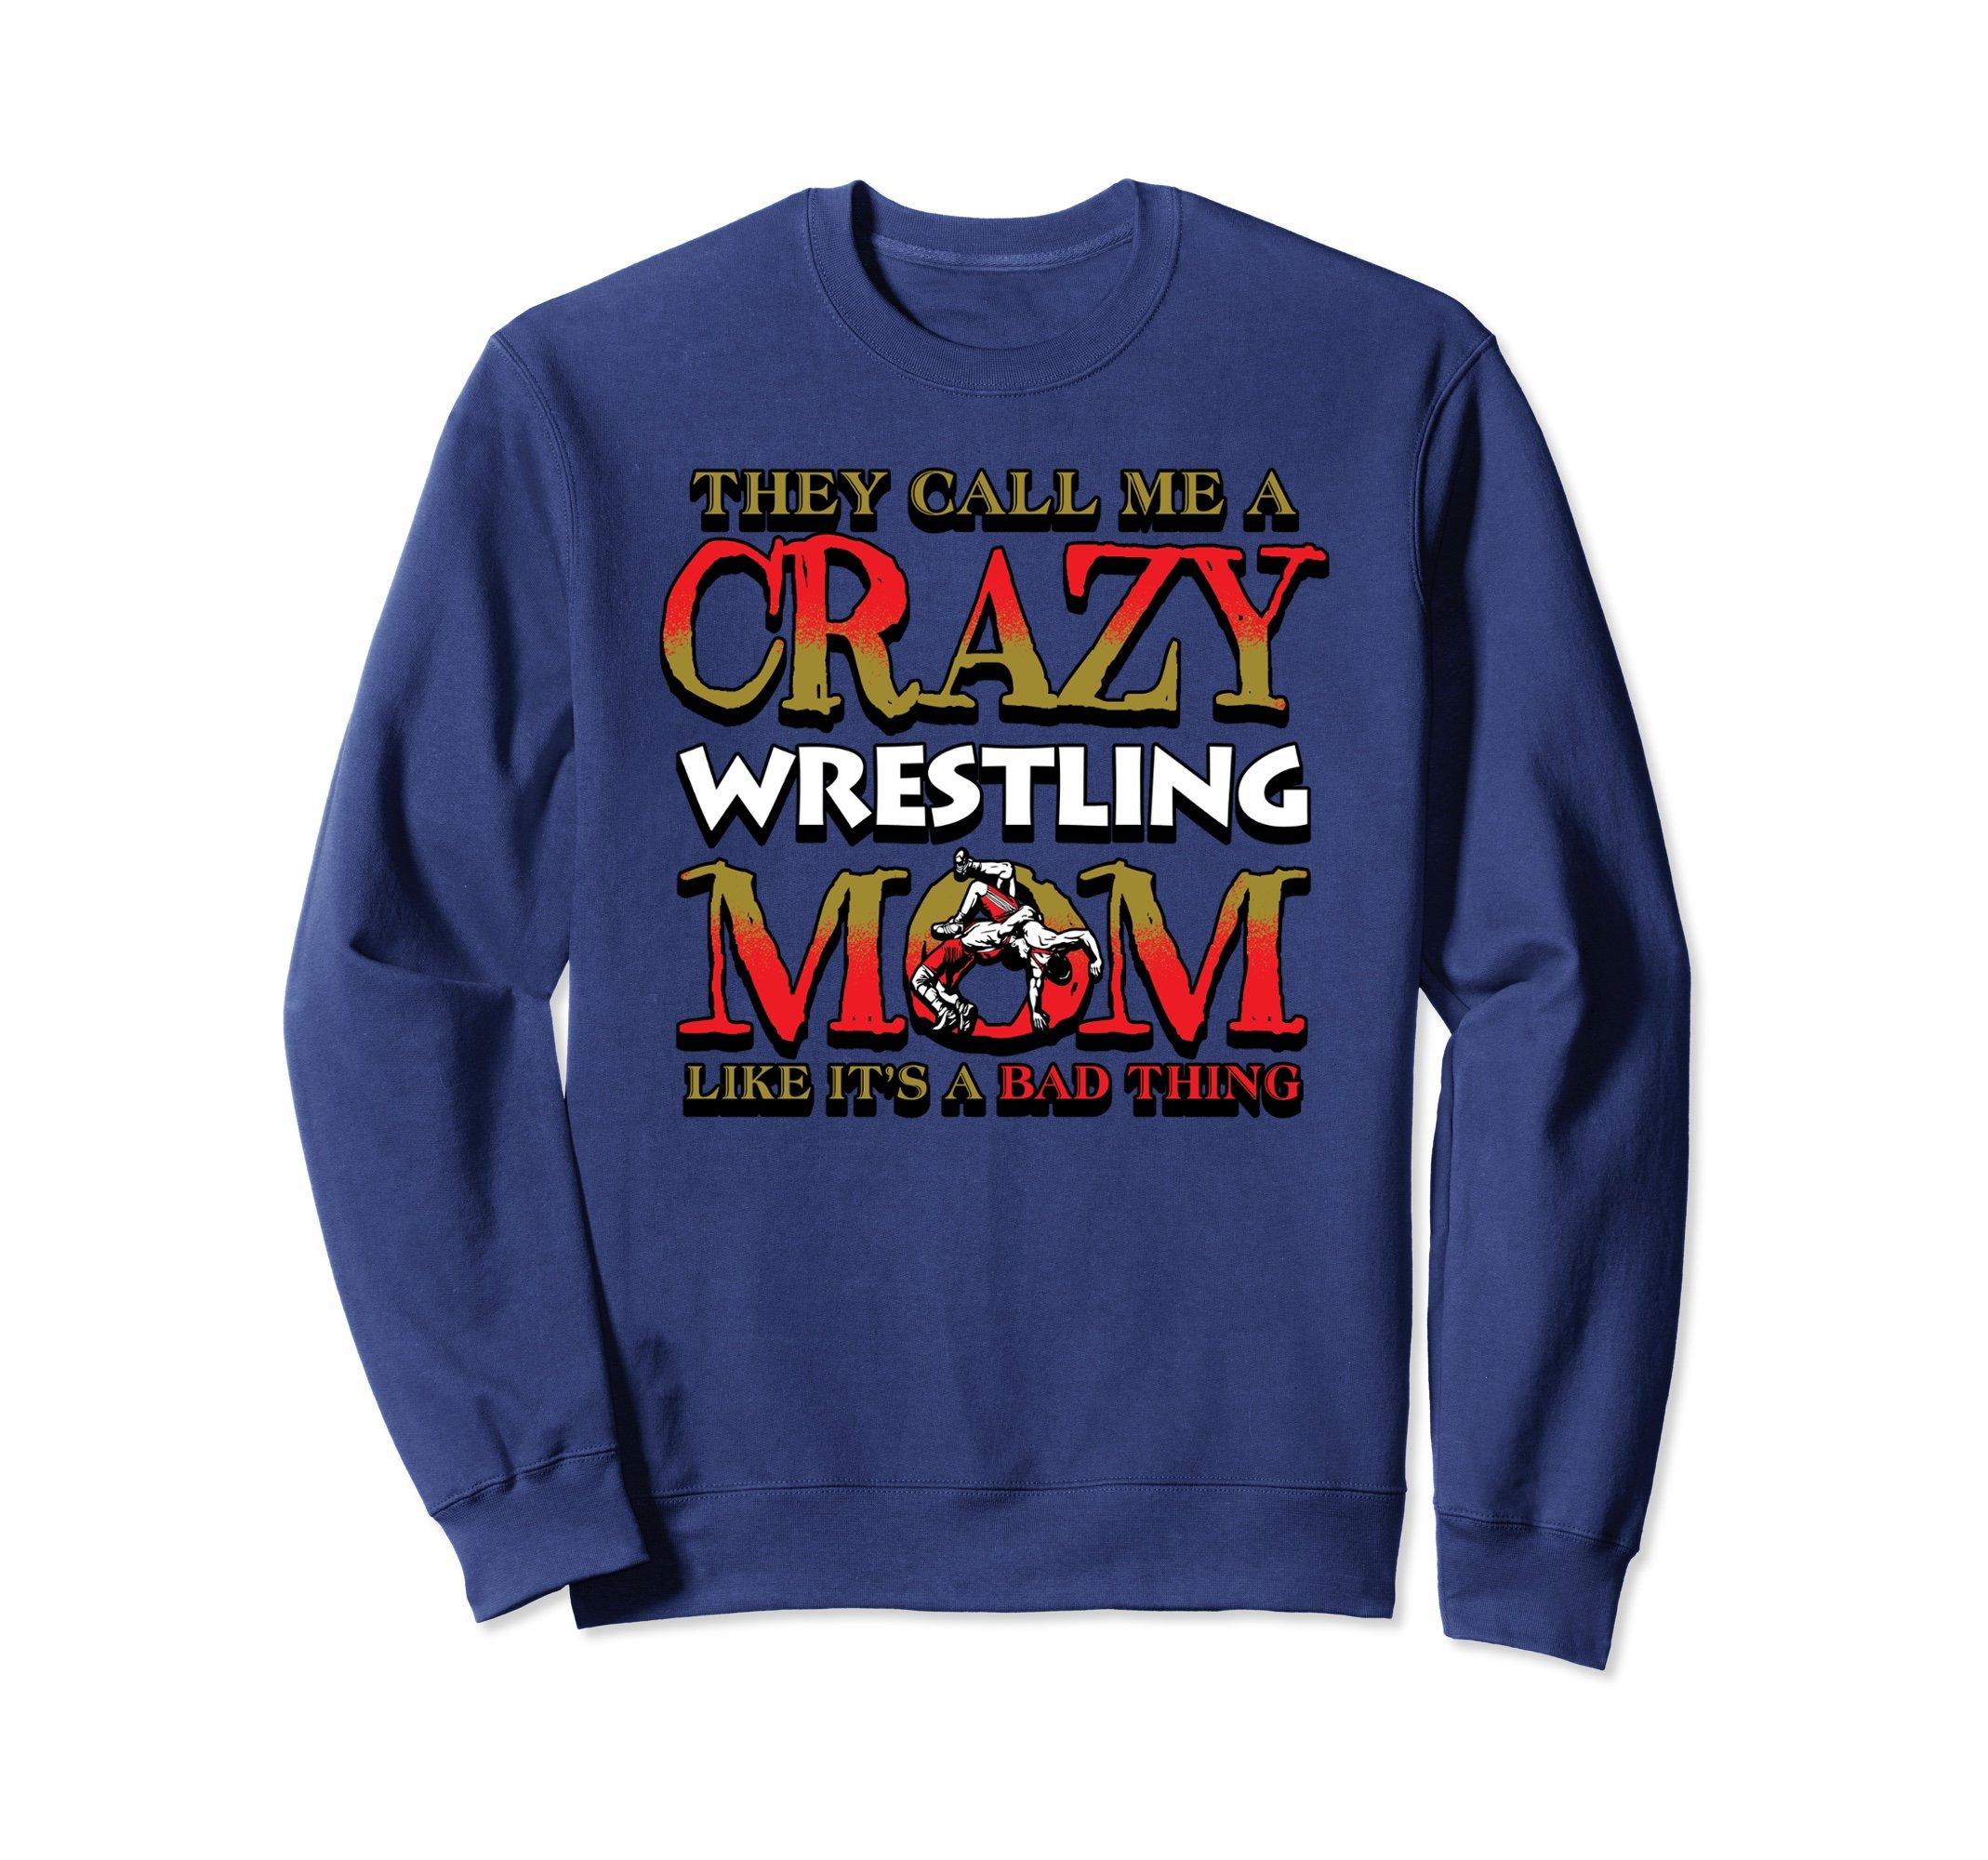 Unisex Wrestling Sweatshirt -Crazy wrestling Mom Sweater Small Navy by Wrestling Shirt by Crush Retro